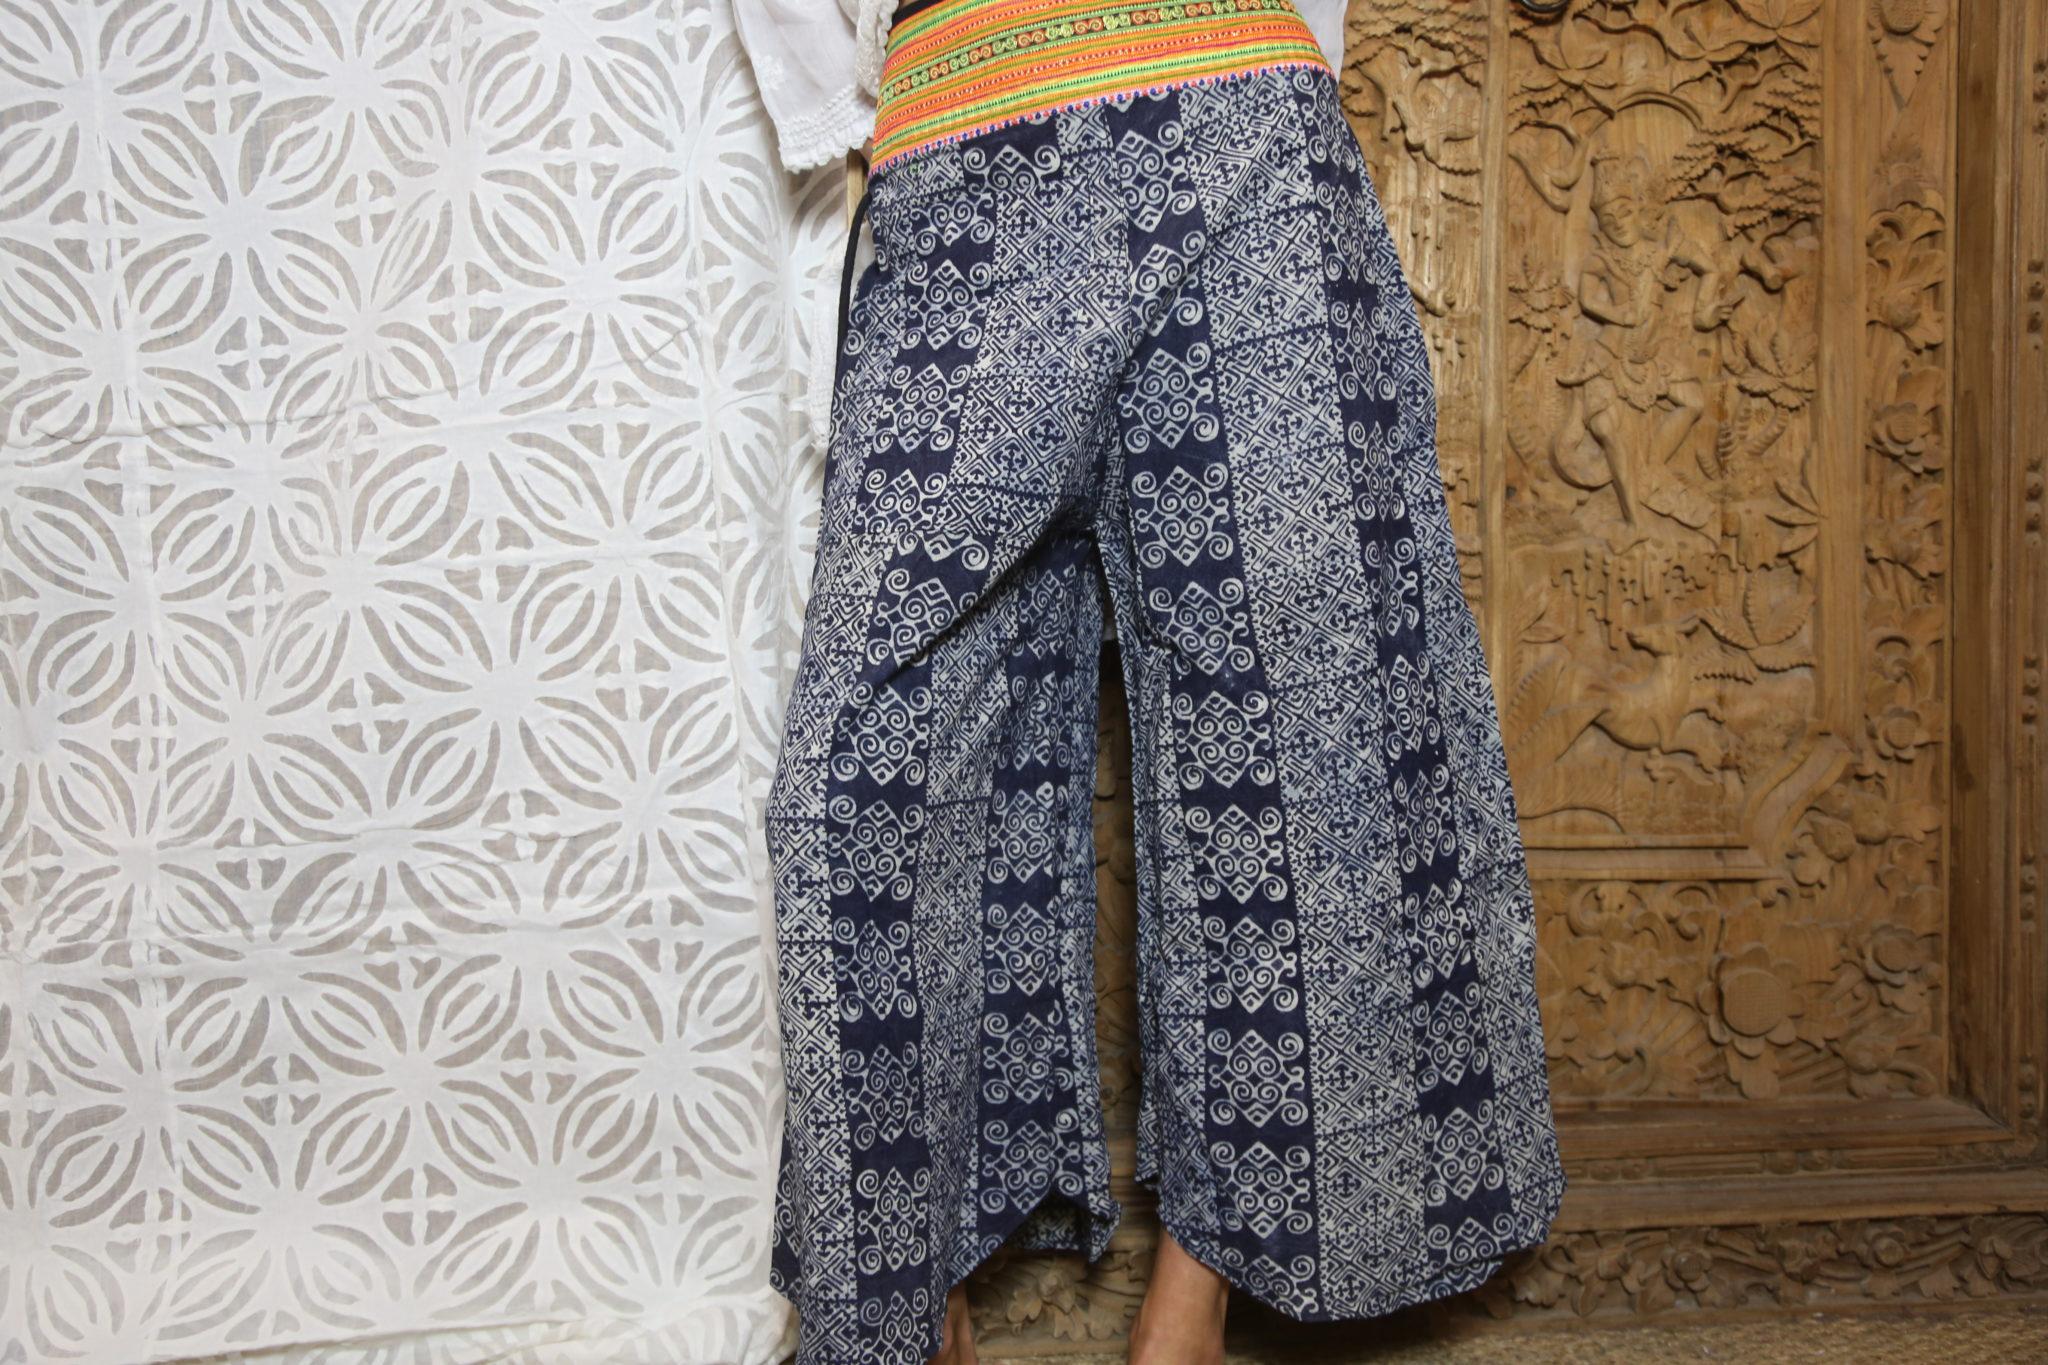 Batik indonésien Indonésie Patrimoine immatériel